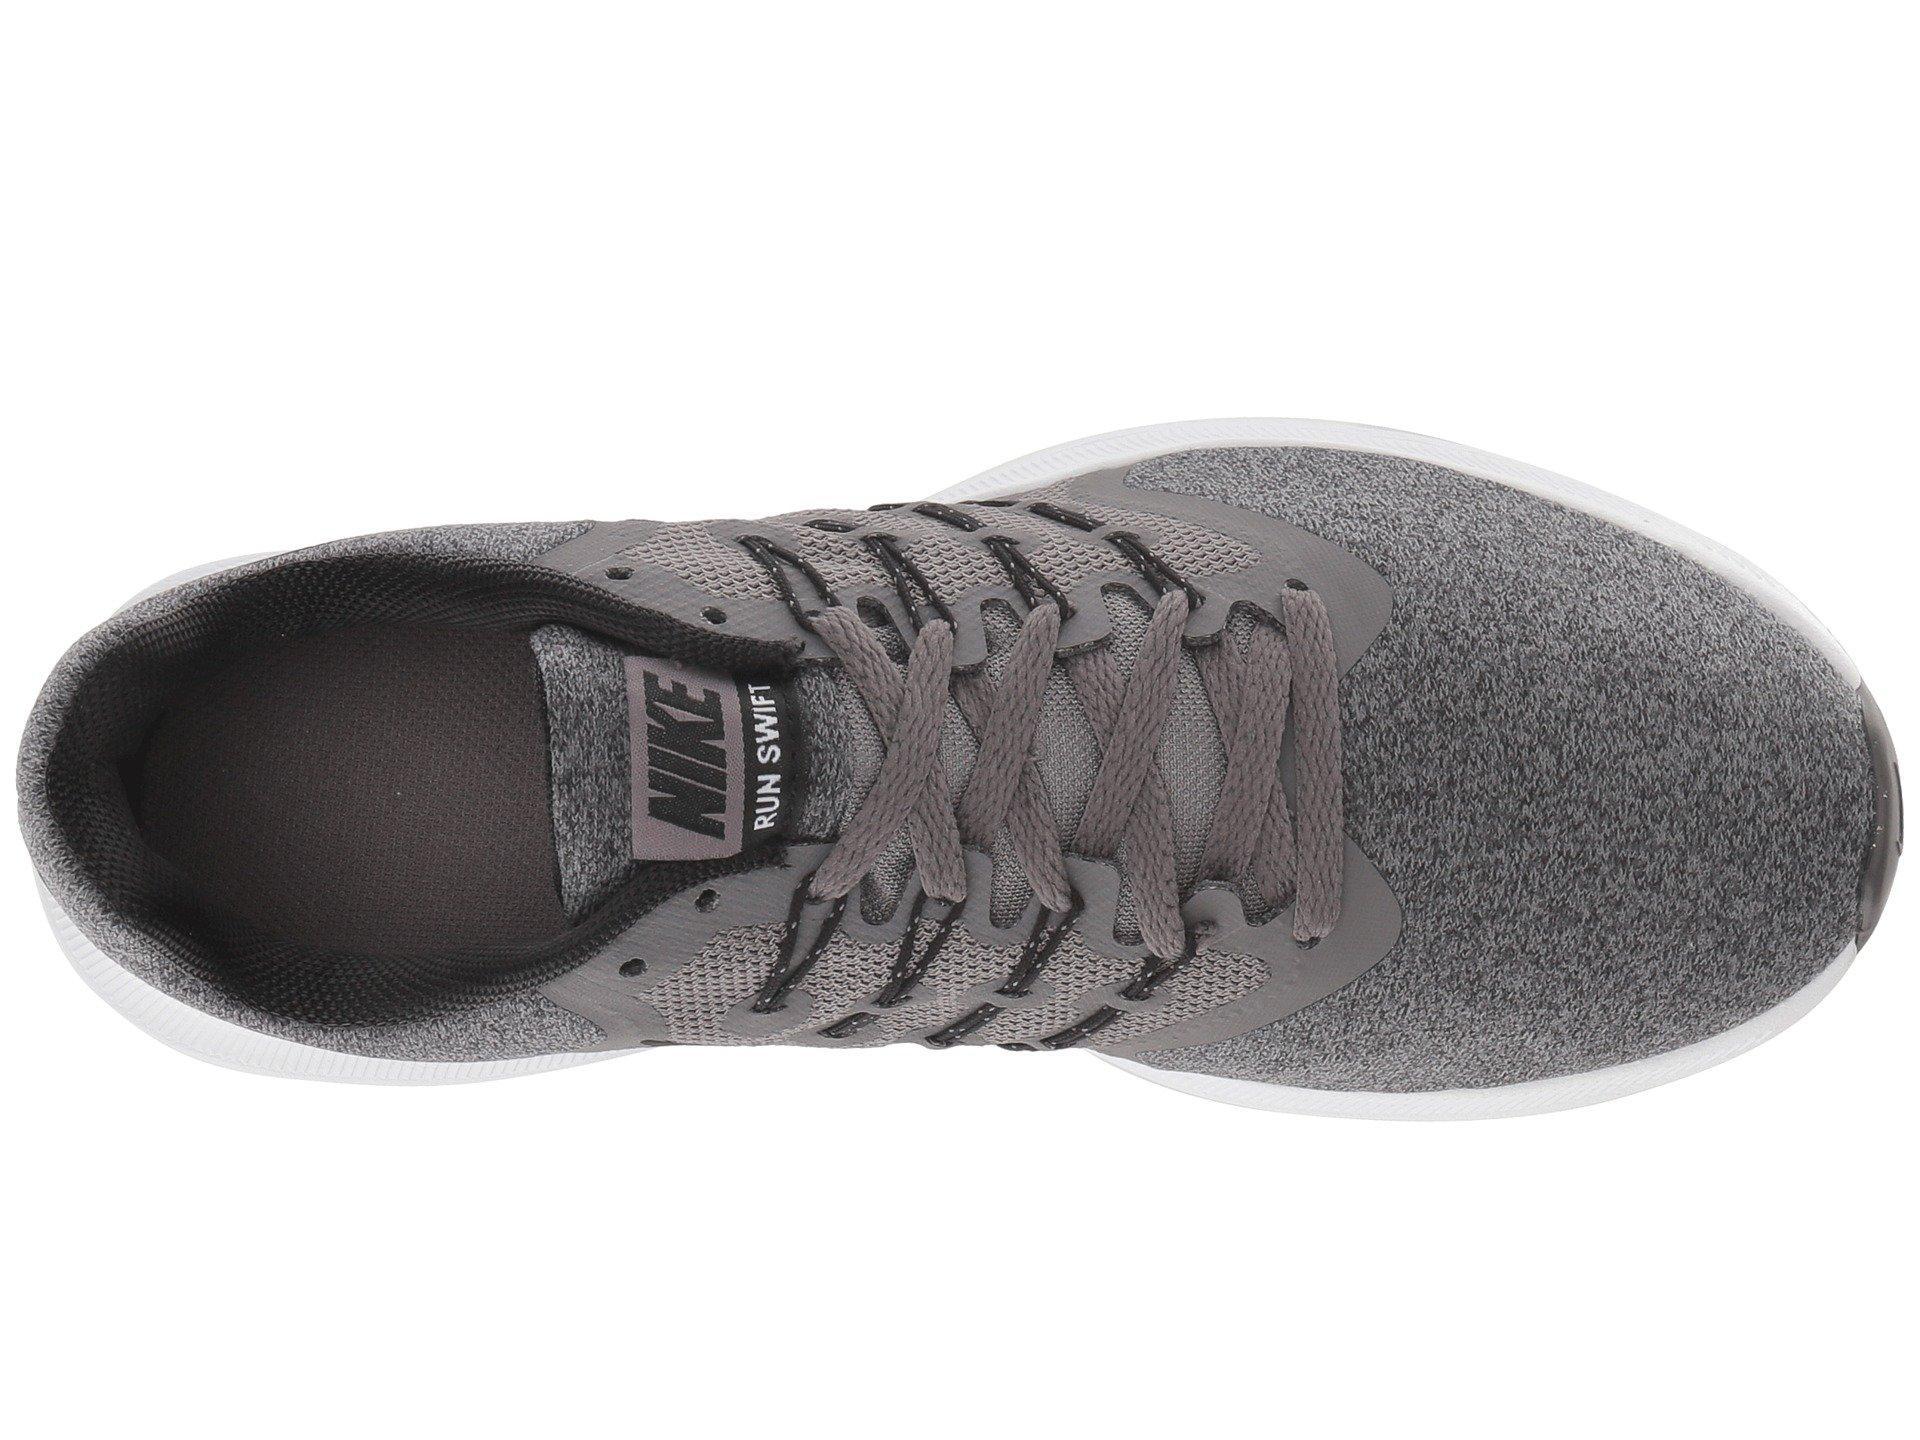 38409b979 Nike - Multicolor Run Swift Sneaker - Lyst. View fullscreen